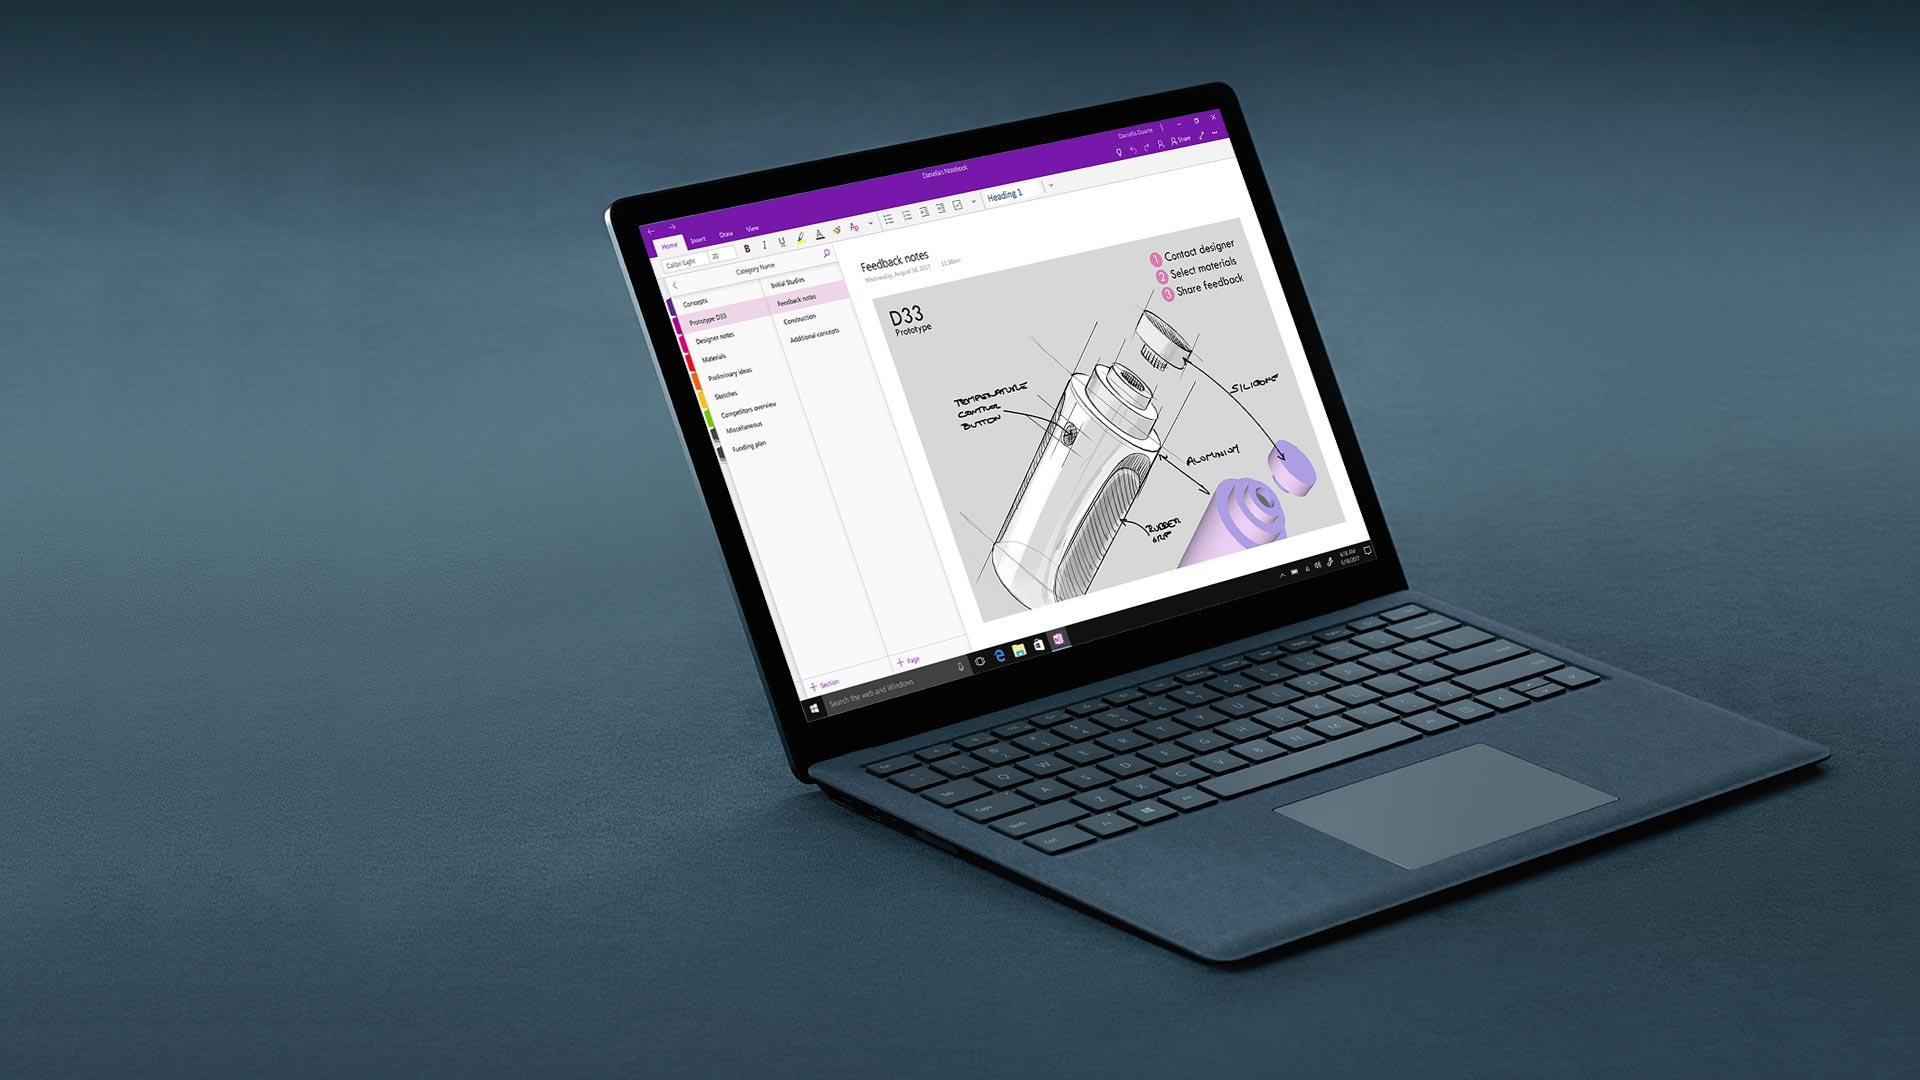 One Note を画面に表示したコバルト ブルーの Surface Laptop。